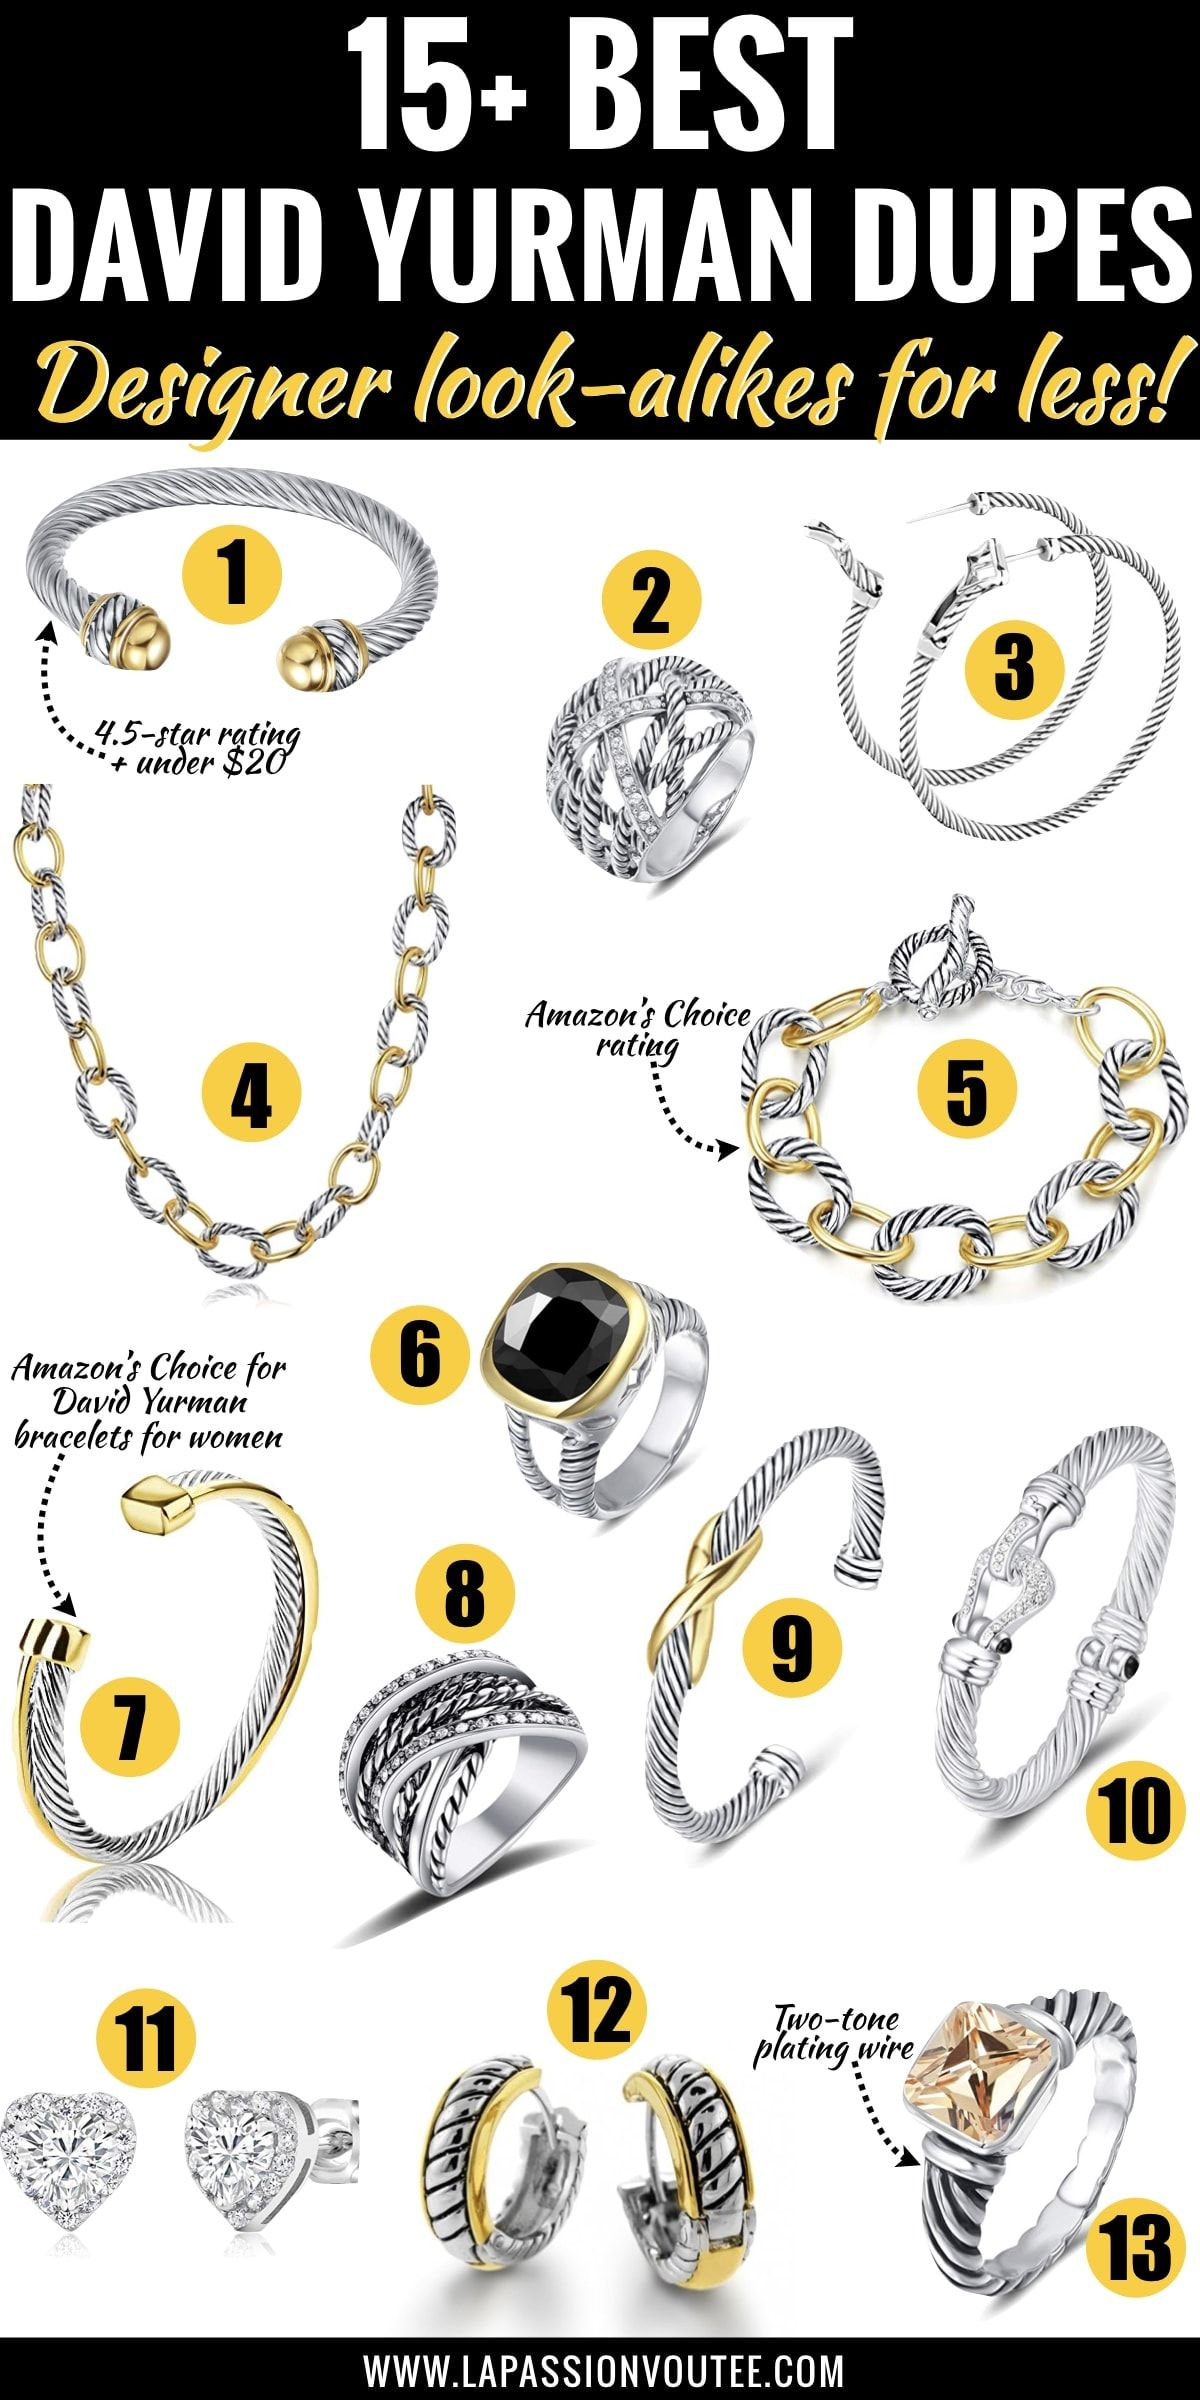 Replica David Yurman : replica, david, yurman, Best-selling, David, Yurman, Dupes!, Ultimate, Guide, Alike, Yur…, Jewelry,, Bracelet,, Black, Fashion, Bloggers